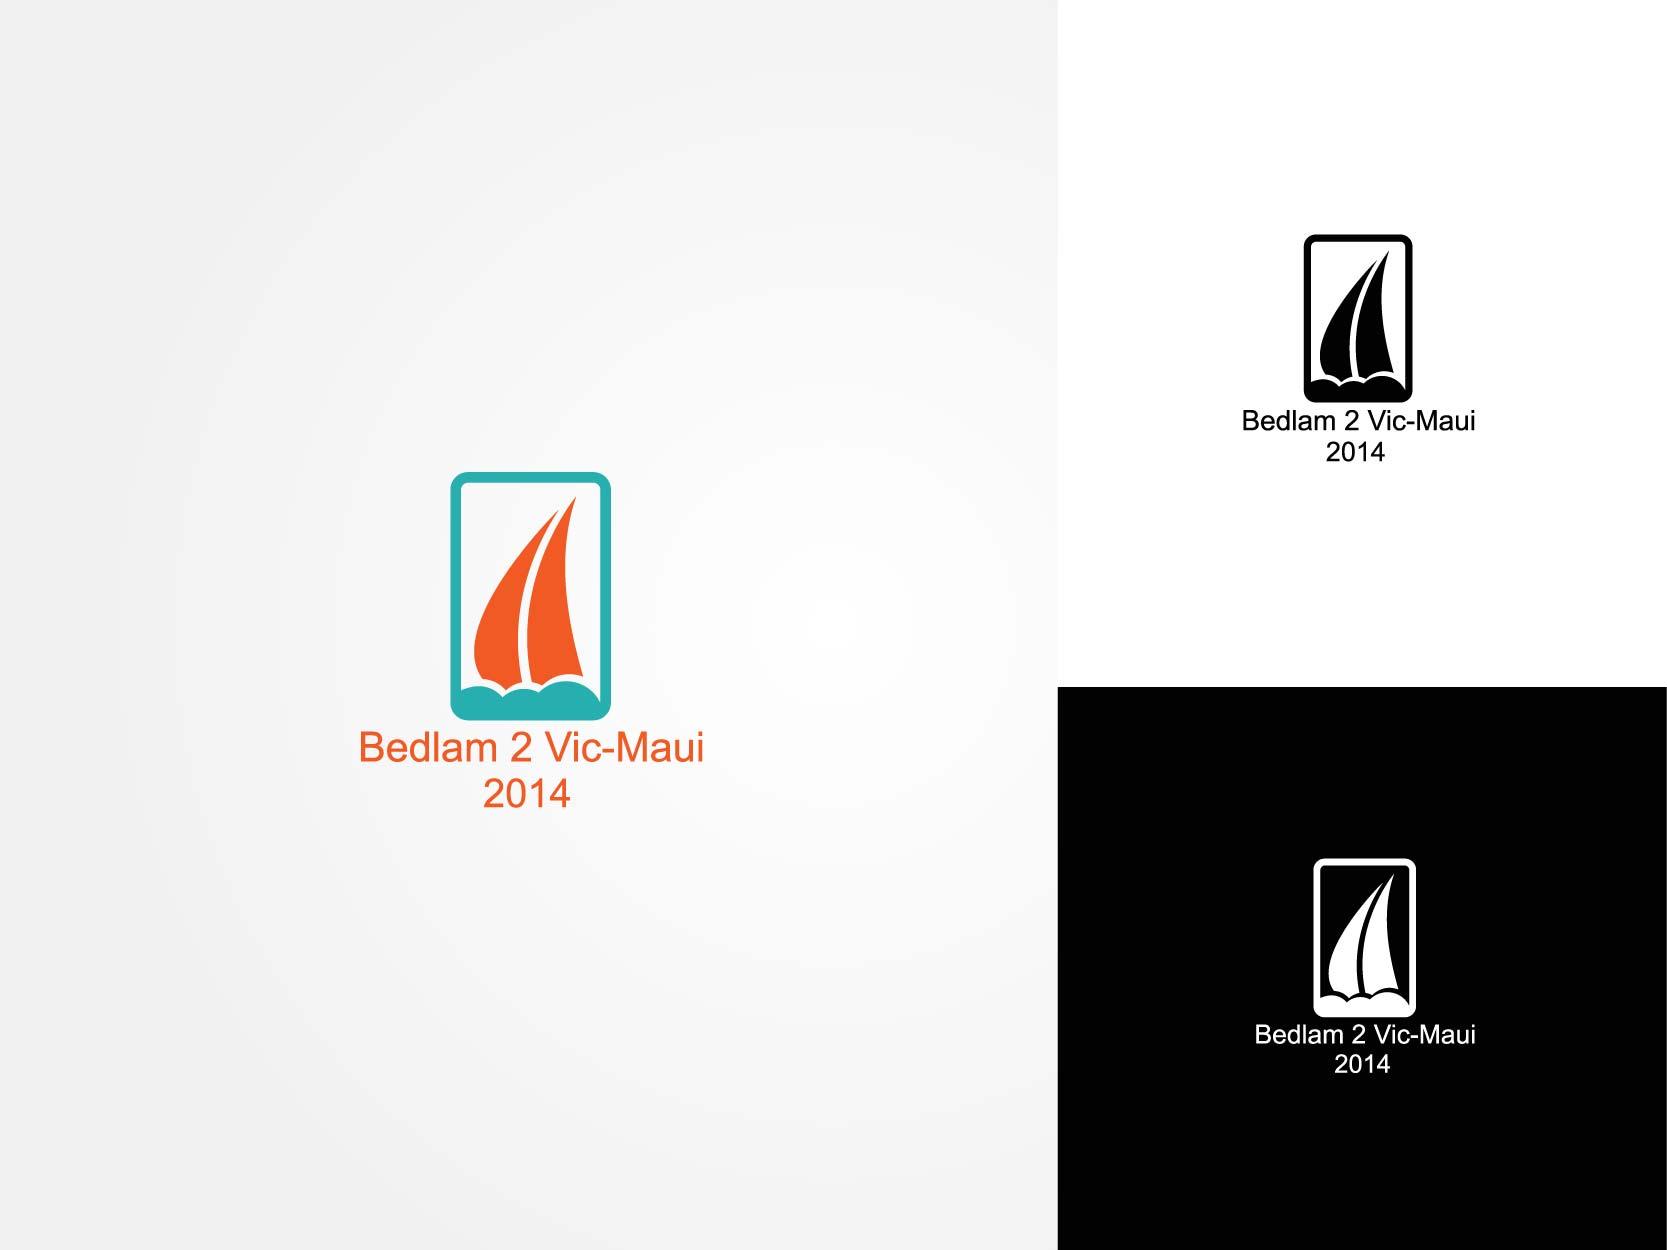 Logo Design by Osi Indra - Entry No. 39 in the Logo Design Contest Artistic Logo Design for Bedlam 2  Vic-Maui 2014.